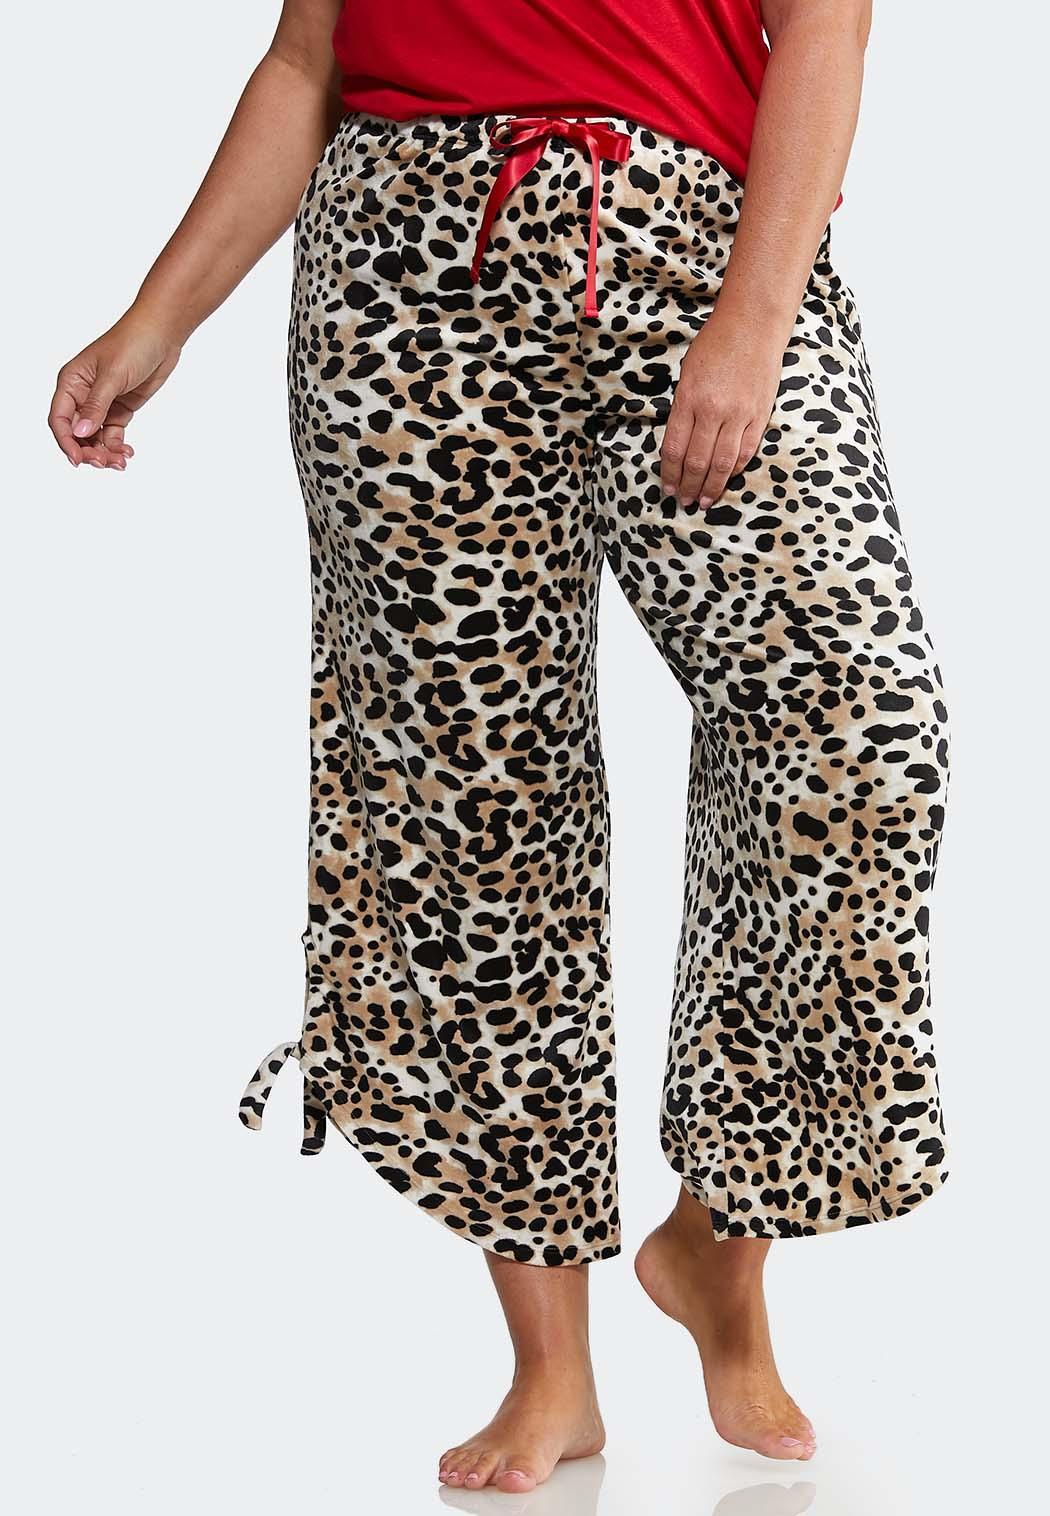 Plus Size Leopard Fleece Lounge Pants